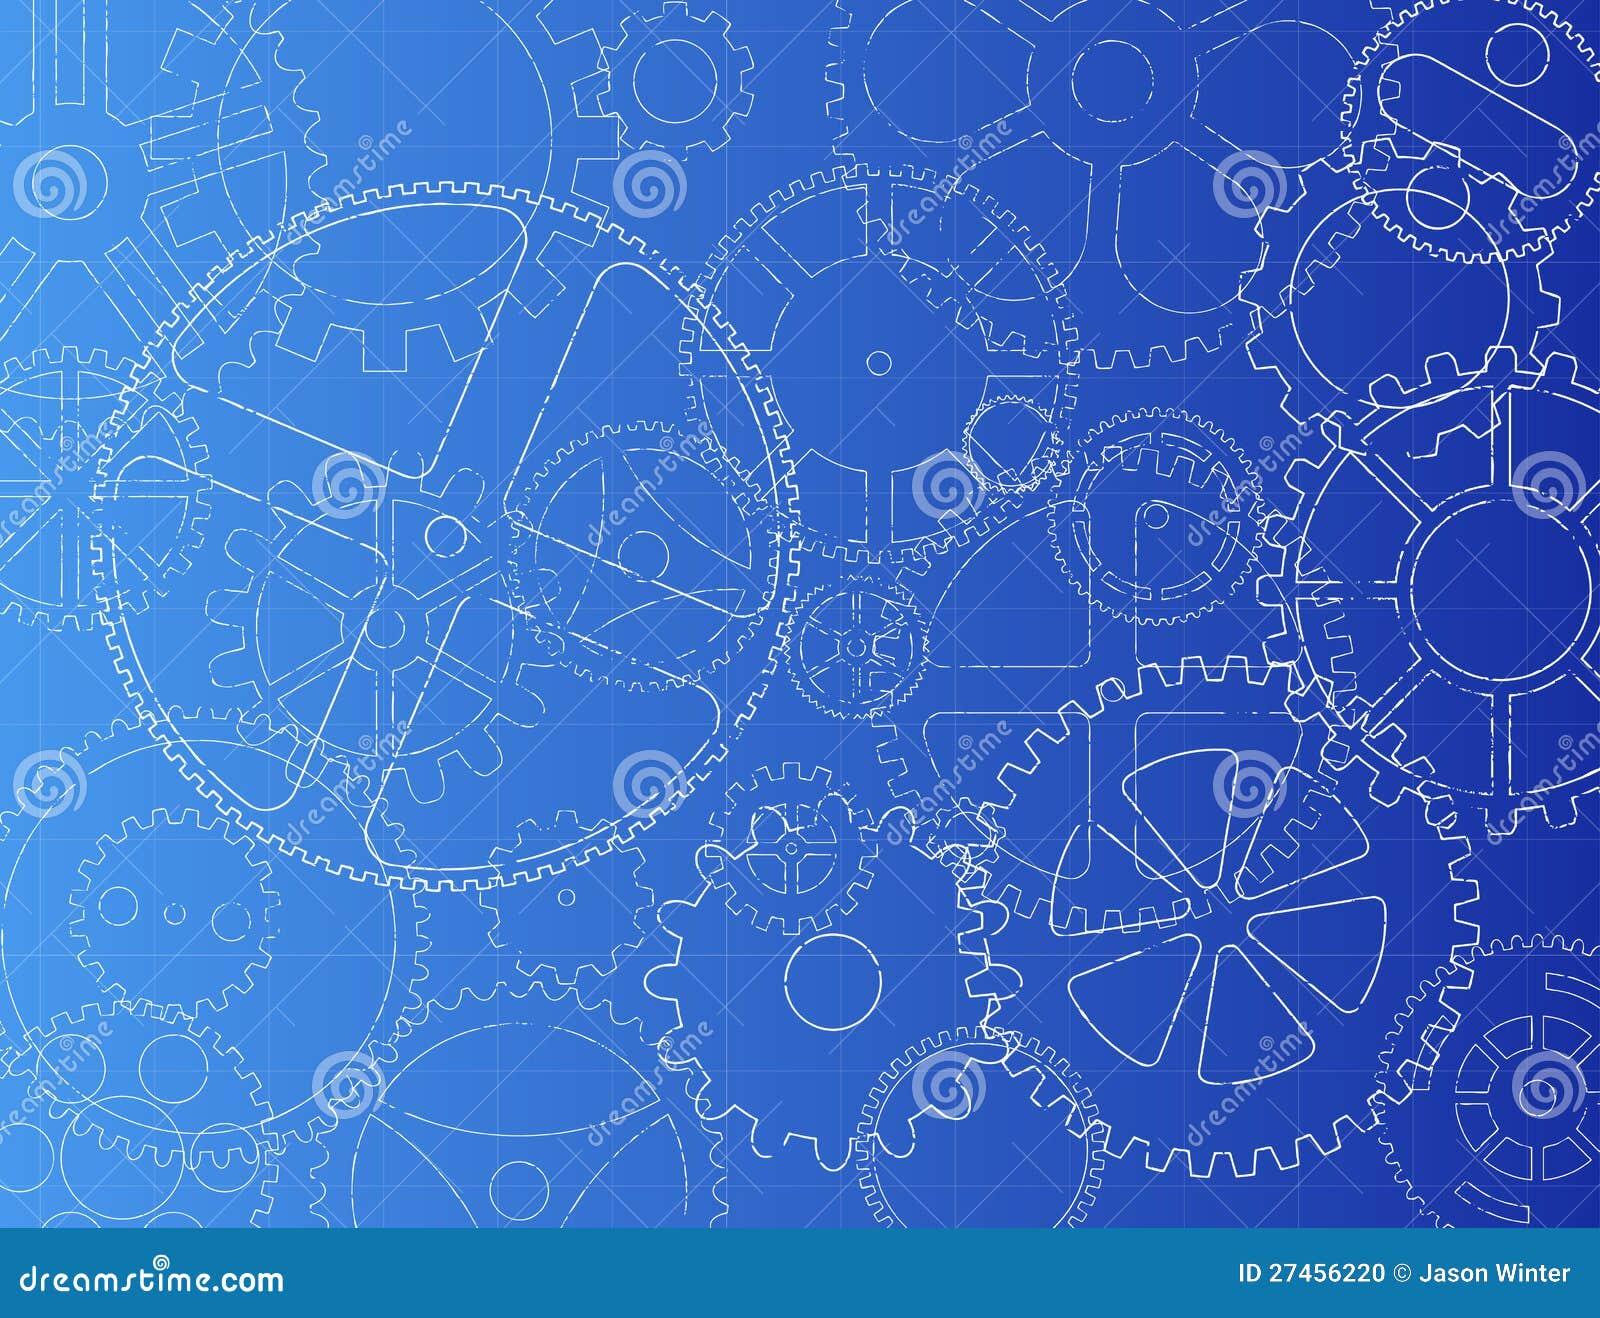 Gears blueprint stock vector illustration of detailed 27456220 gears blueprint malvernweather Gallery